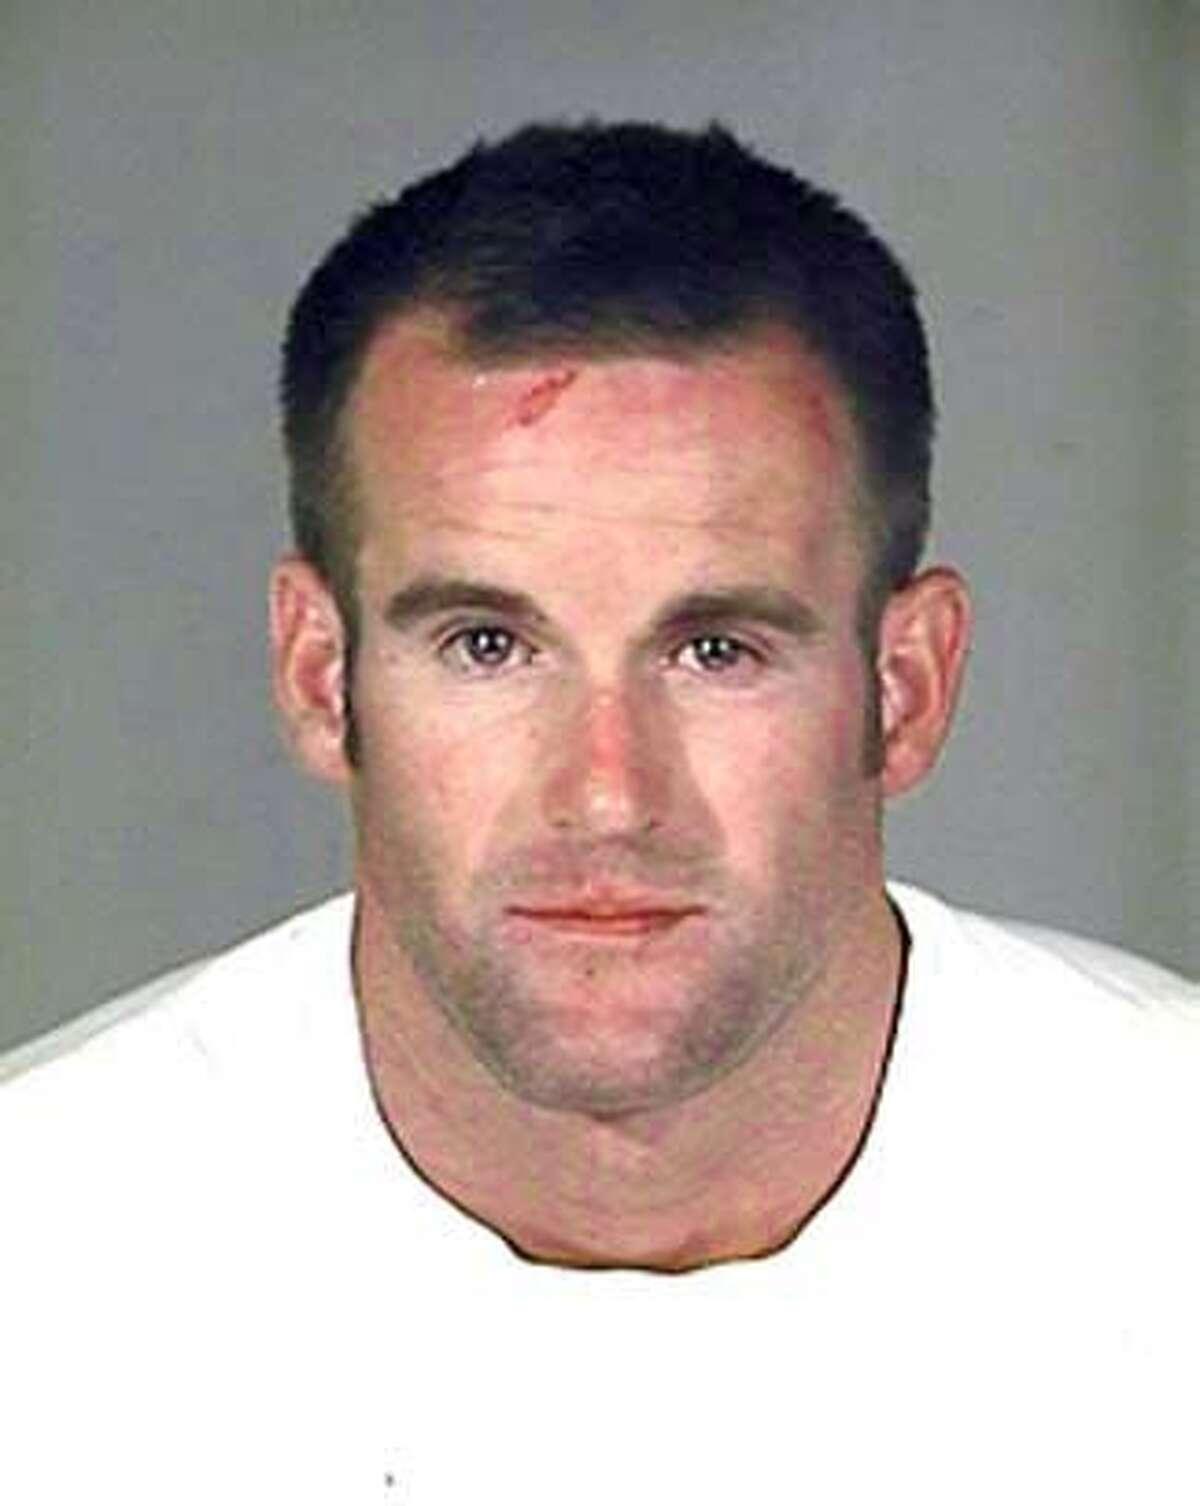 NEWS -- Former San Francisco police officer Alex Fagan Jr. (submitted photo) March 26, 2004. ALSO RAN: 07/02/2004; 07/07/2004 Alex Fagan Jr. Metro#Metro#Chronicle#3/28/2004#ALL#3star#B1#0421695116